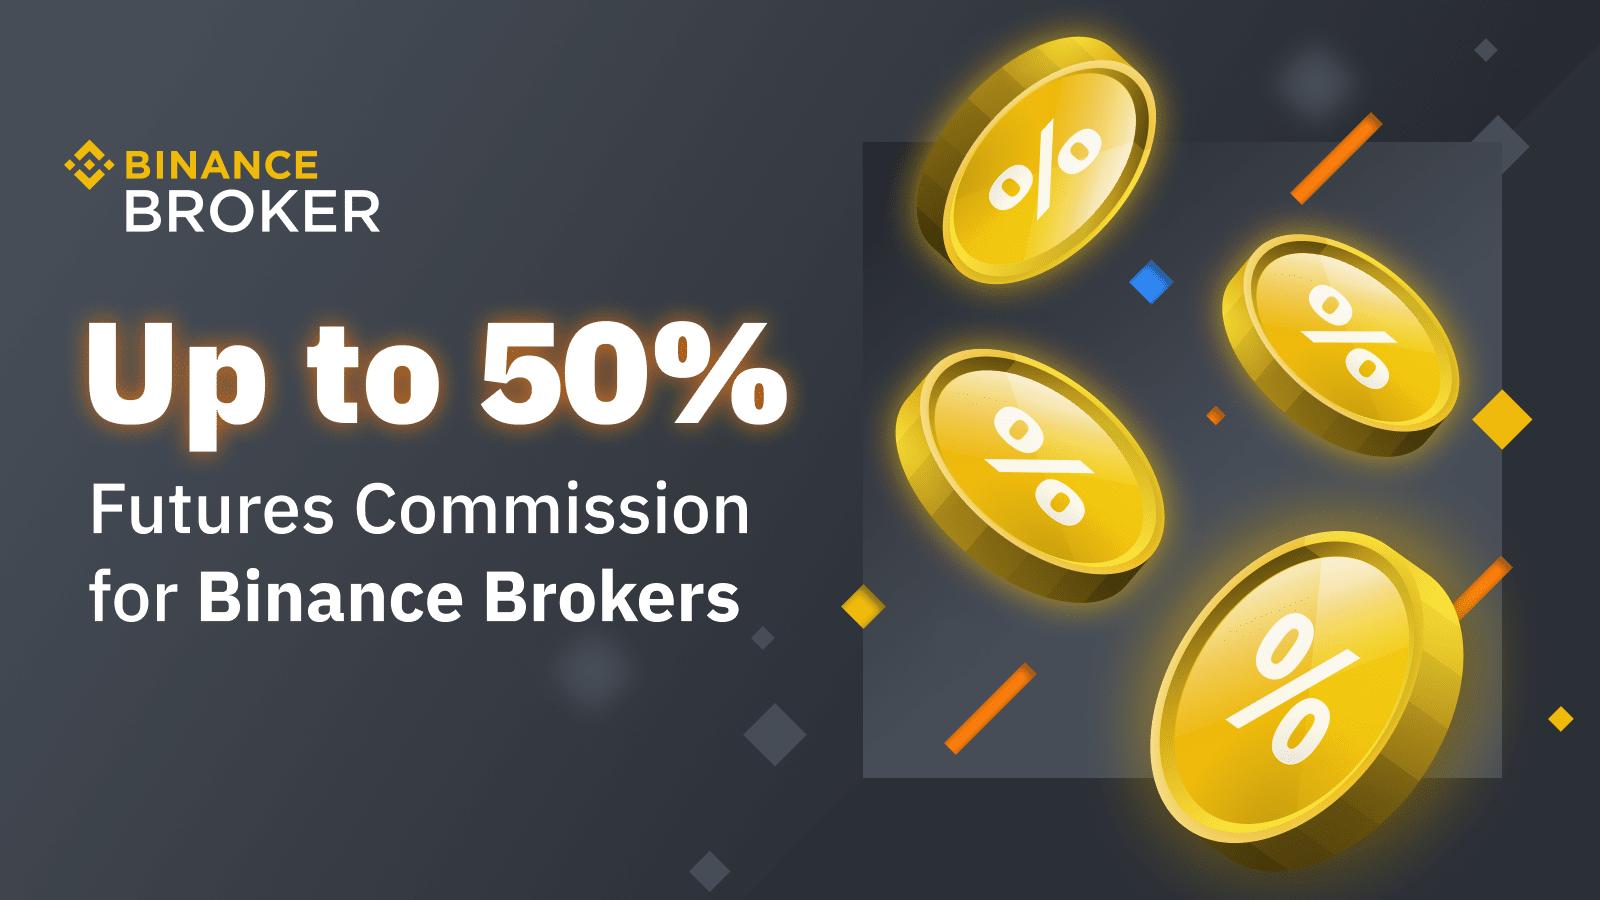 Binance Broker's Bonus Activity for DecemberCryptocurrency Trading Signals, Strategies & Templates | DexStrats